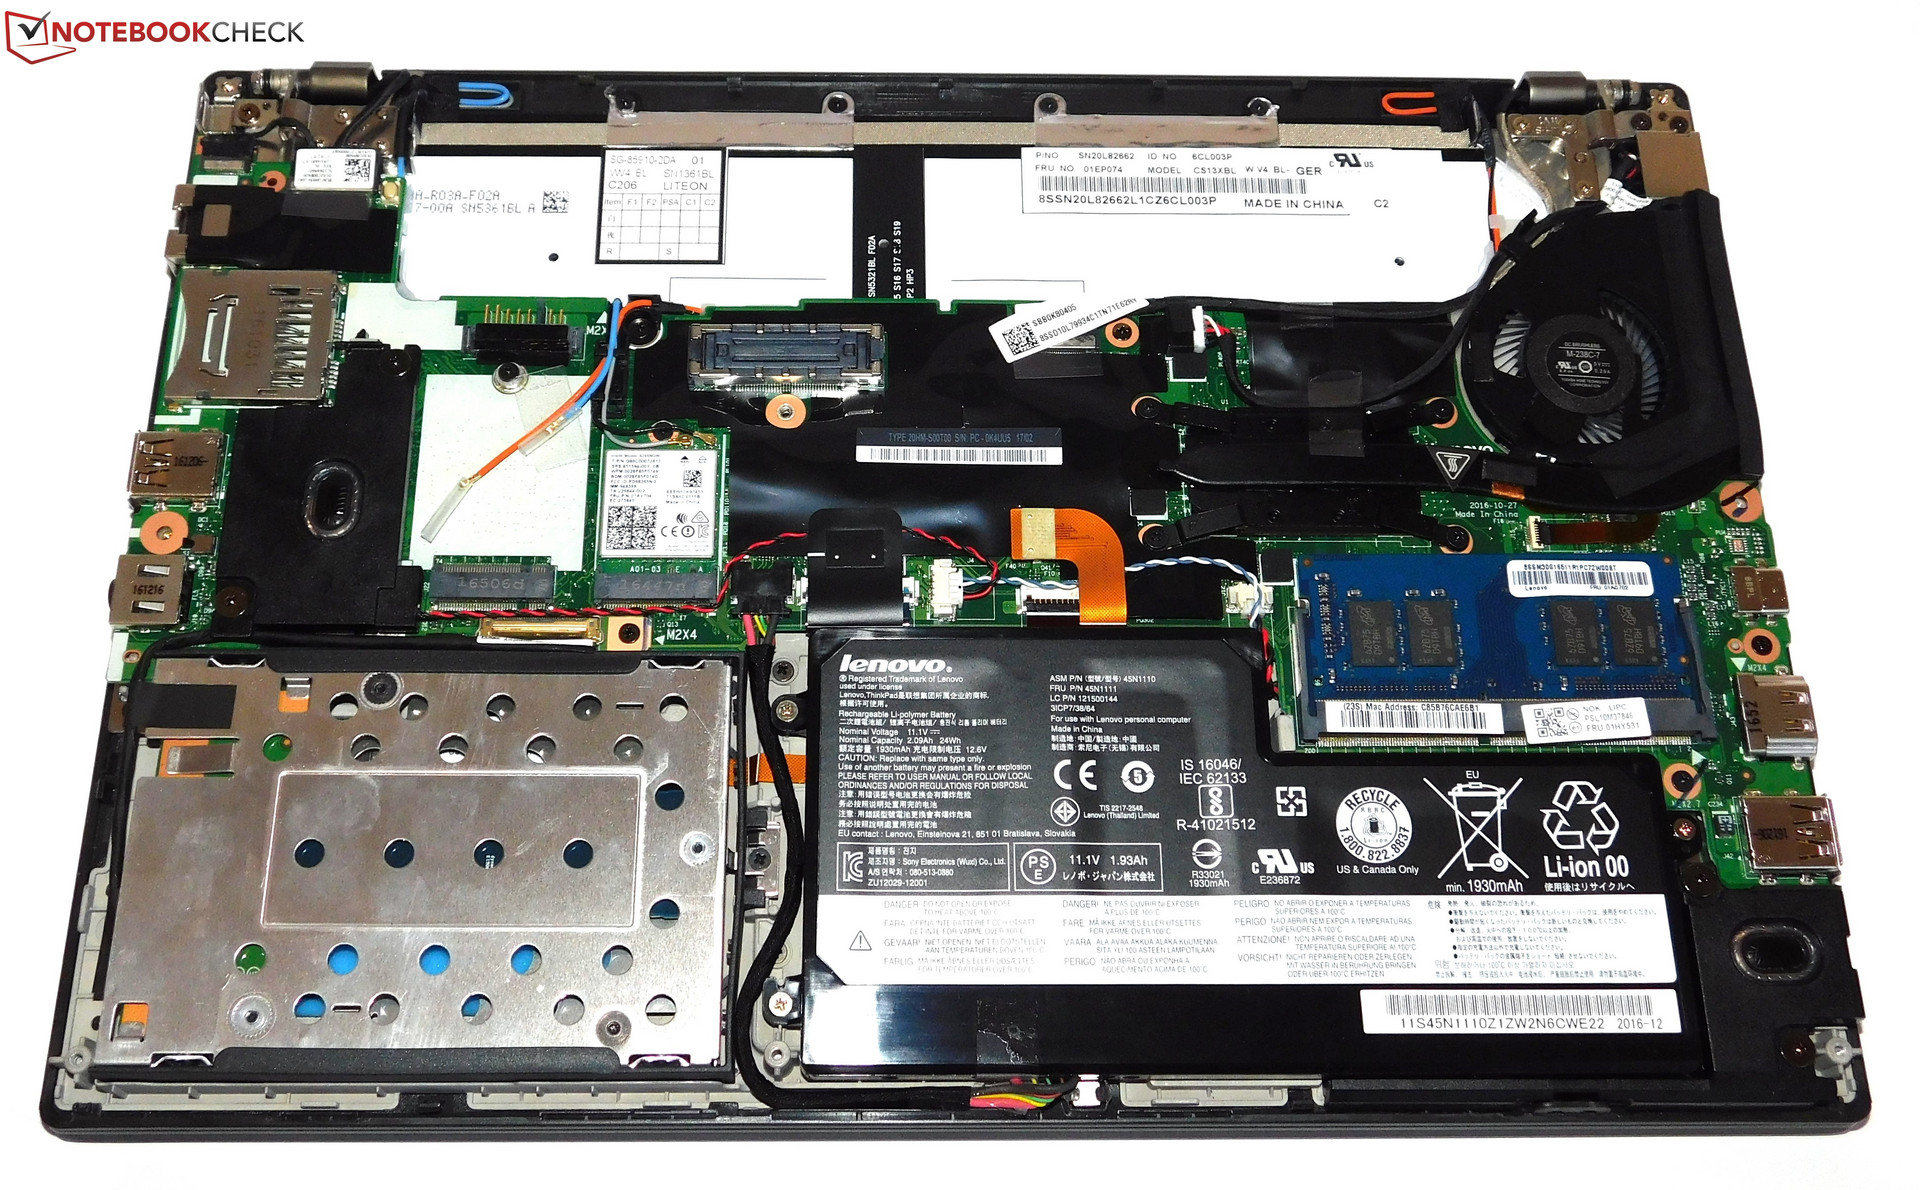 Lenovo Thinkpad X270 Core I5 Full Hd Laptop Review